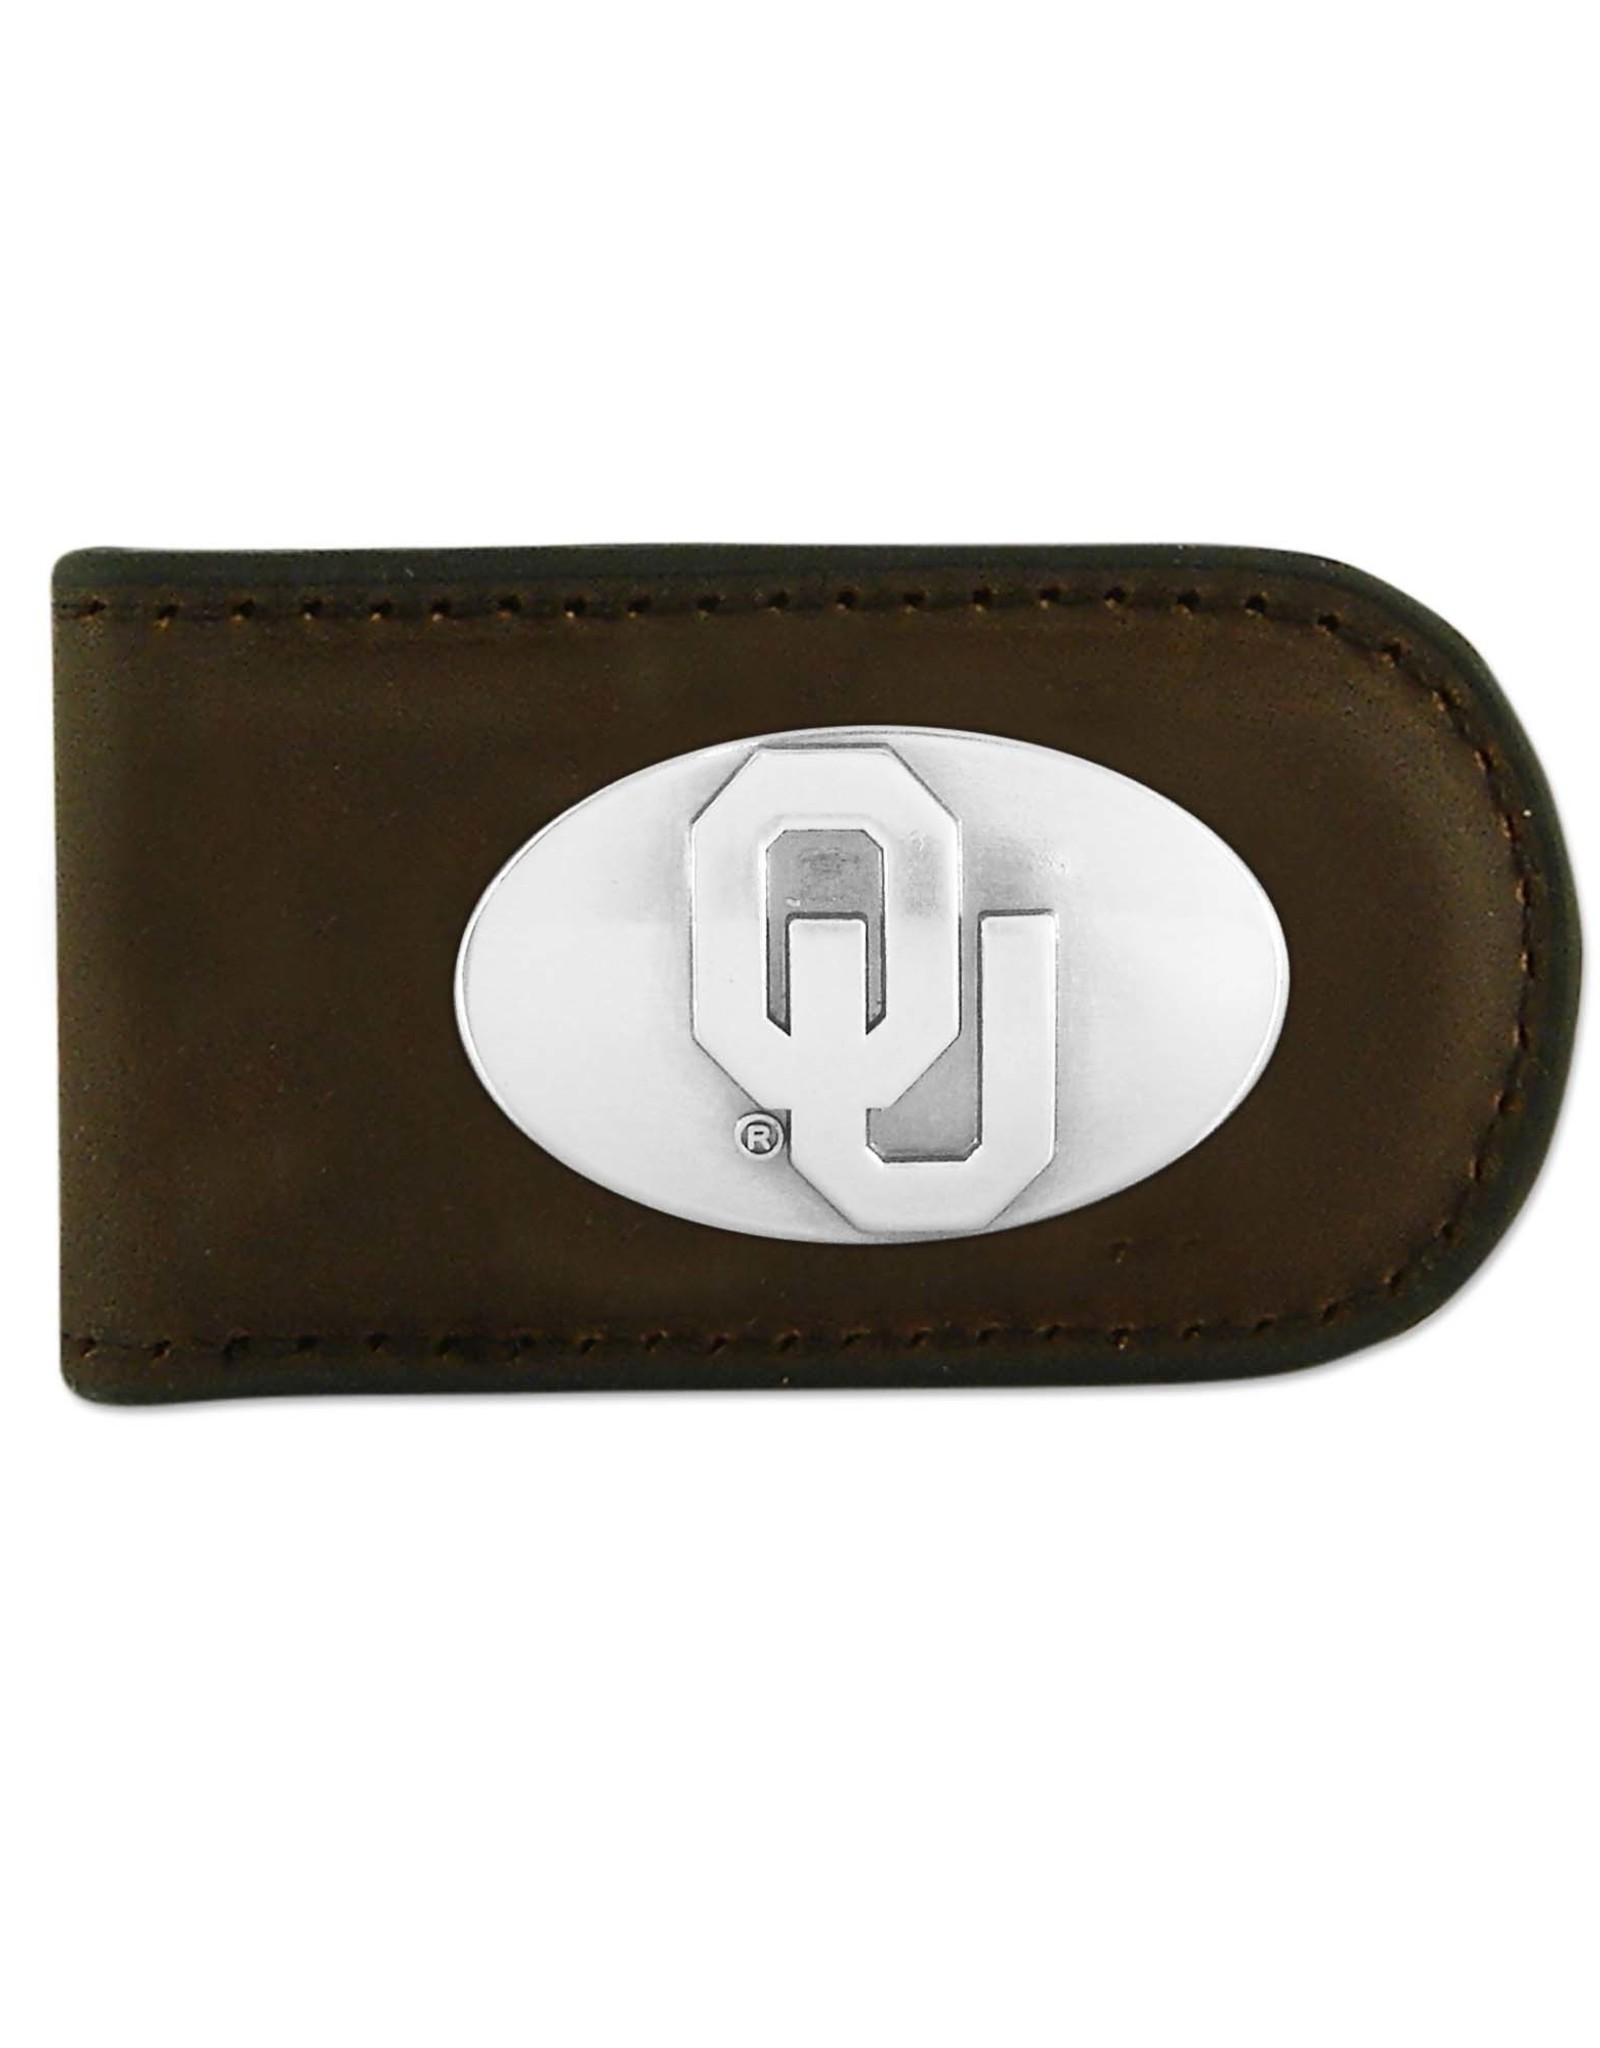 Zep-Pro Zep-Pro Magnetic Money Clip Brown